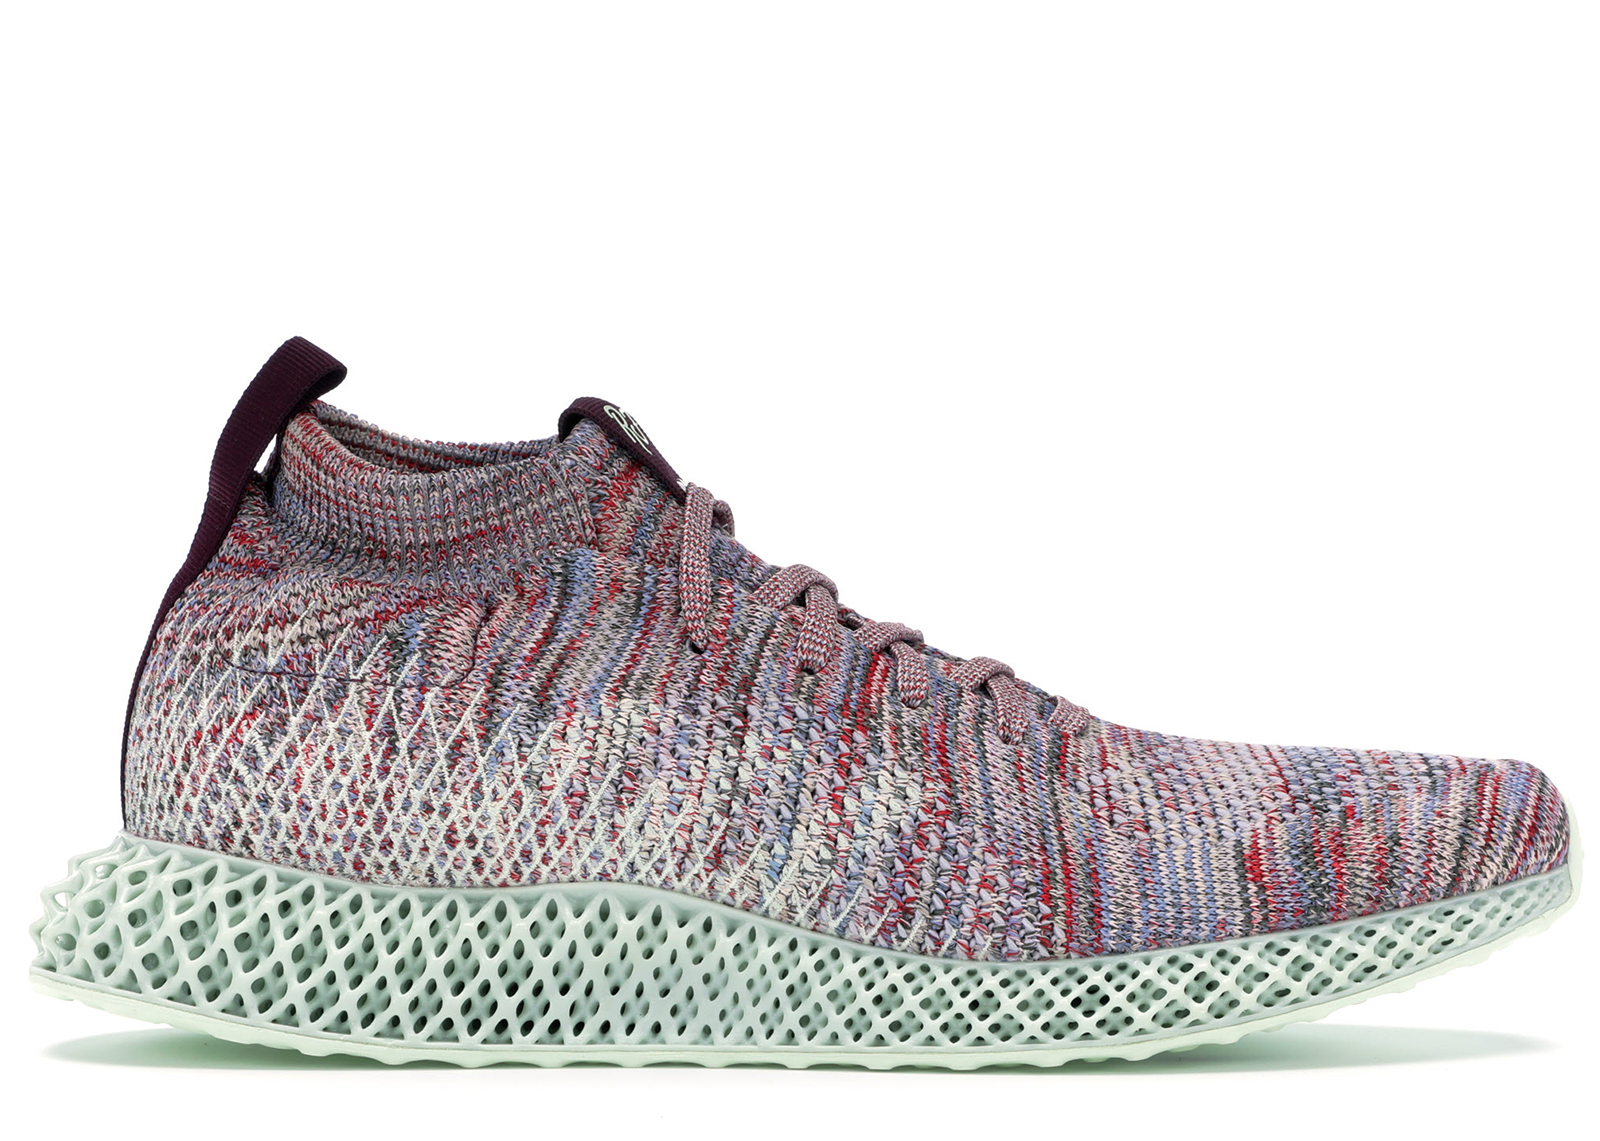 Adidas Consortium | Footpatrol